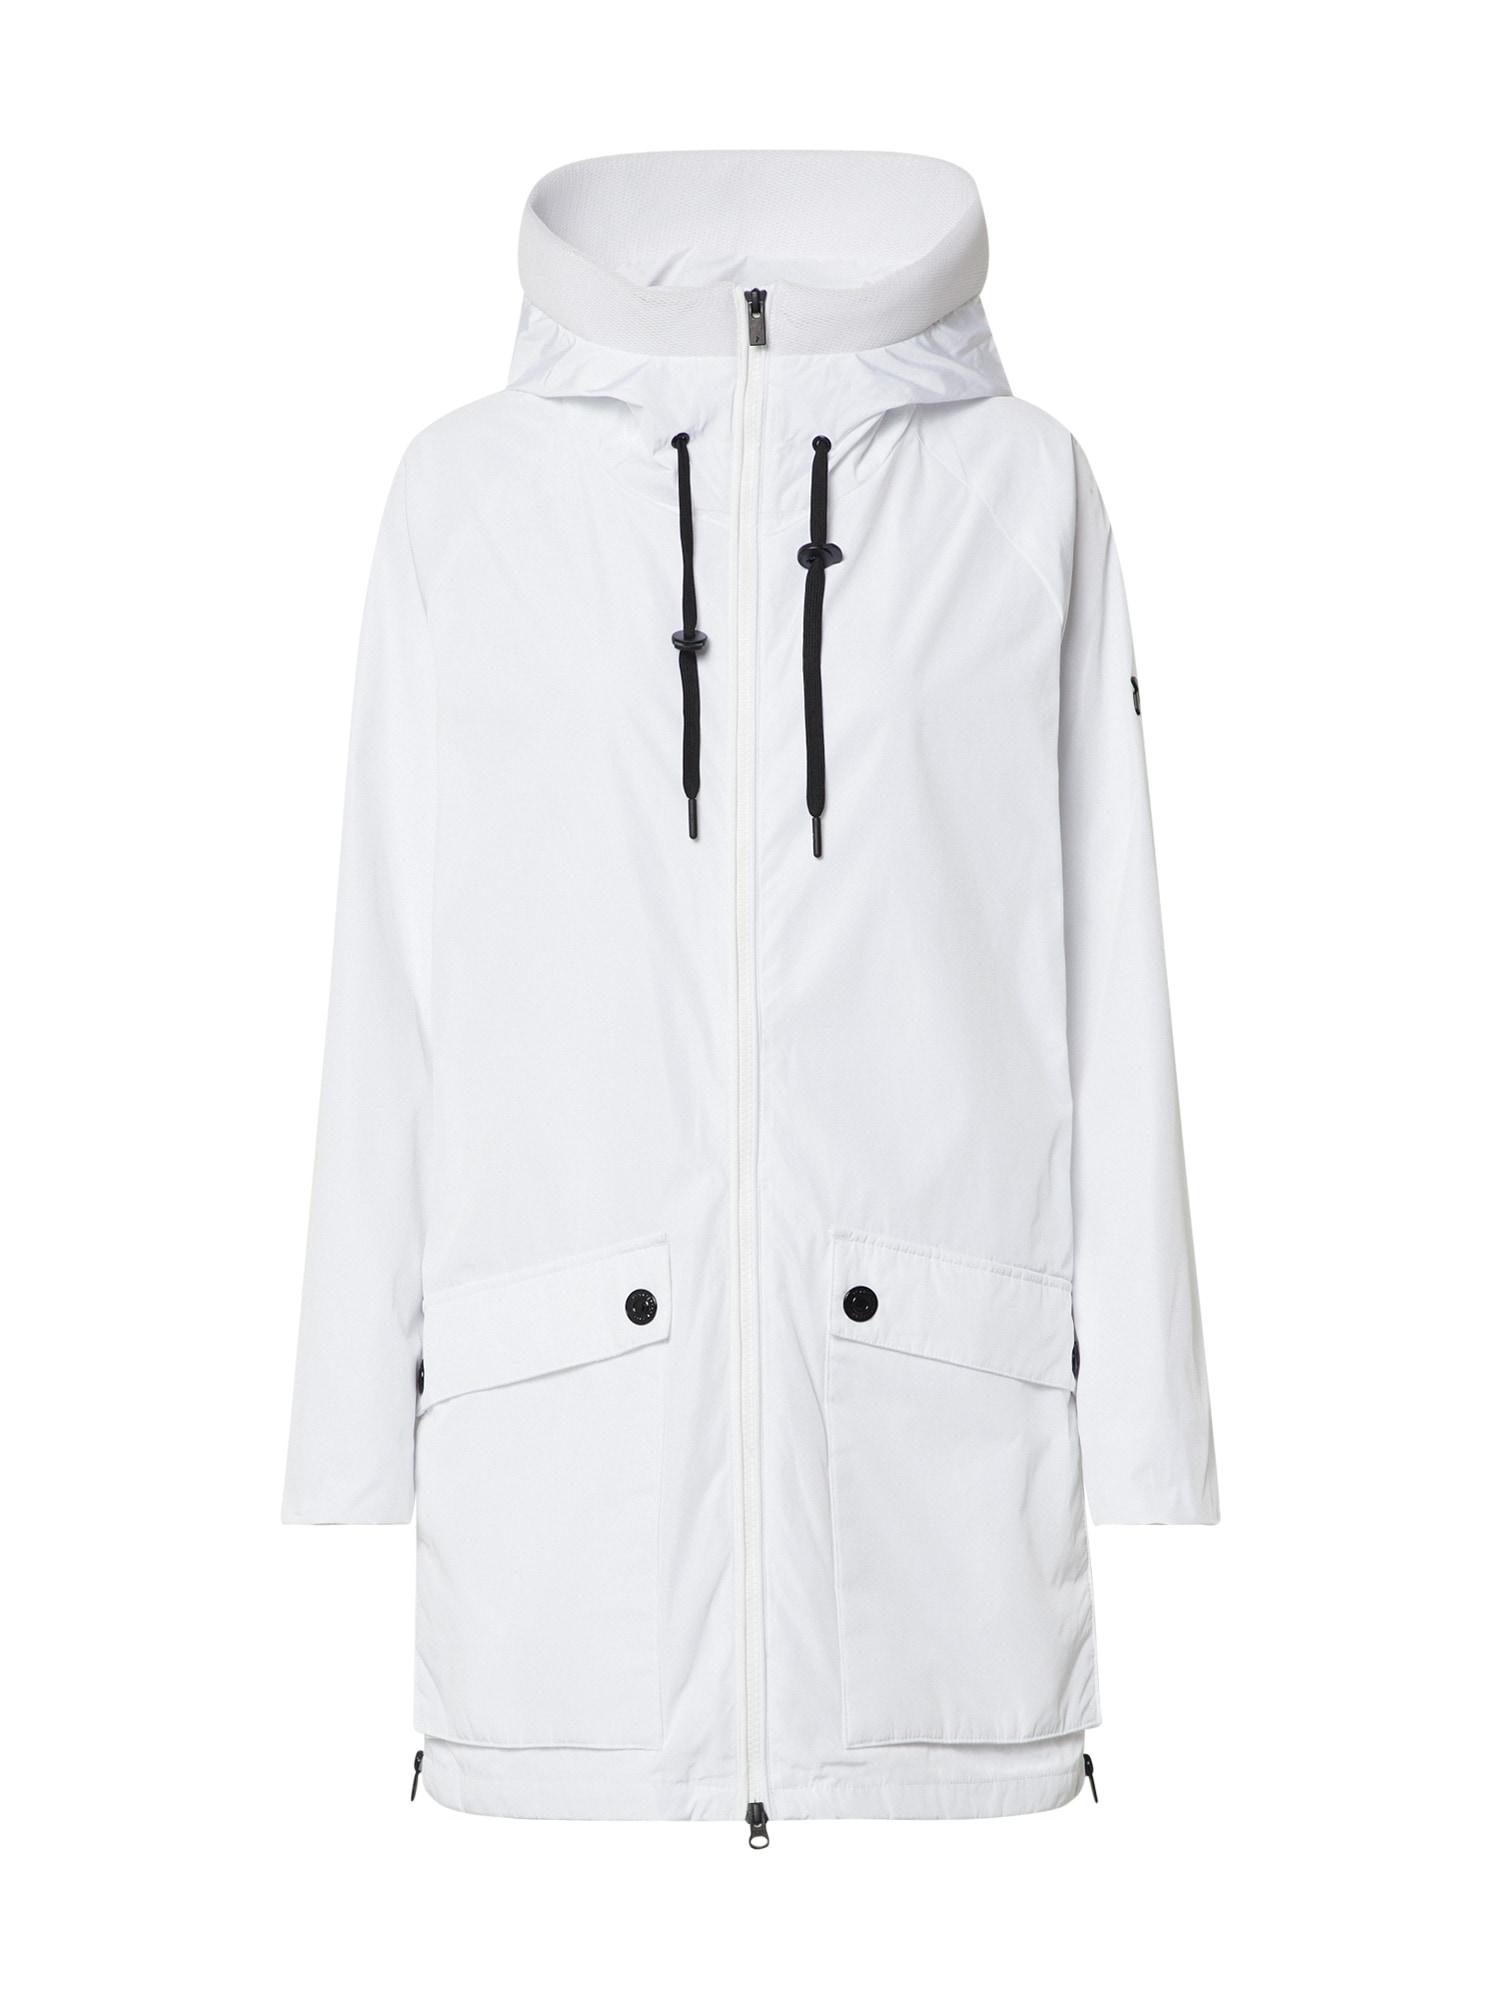 PEAK PERFORMANCE Rudeninis-žieminis paltas 'STELLA' balta